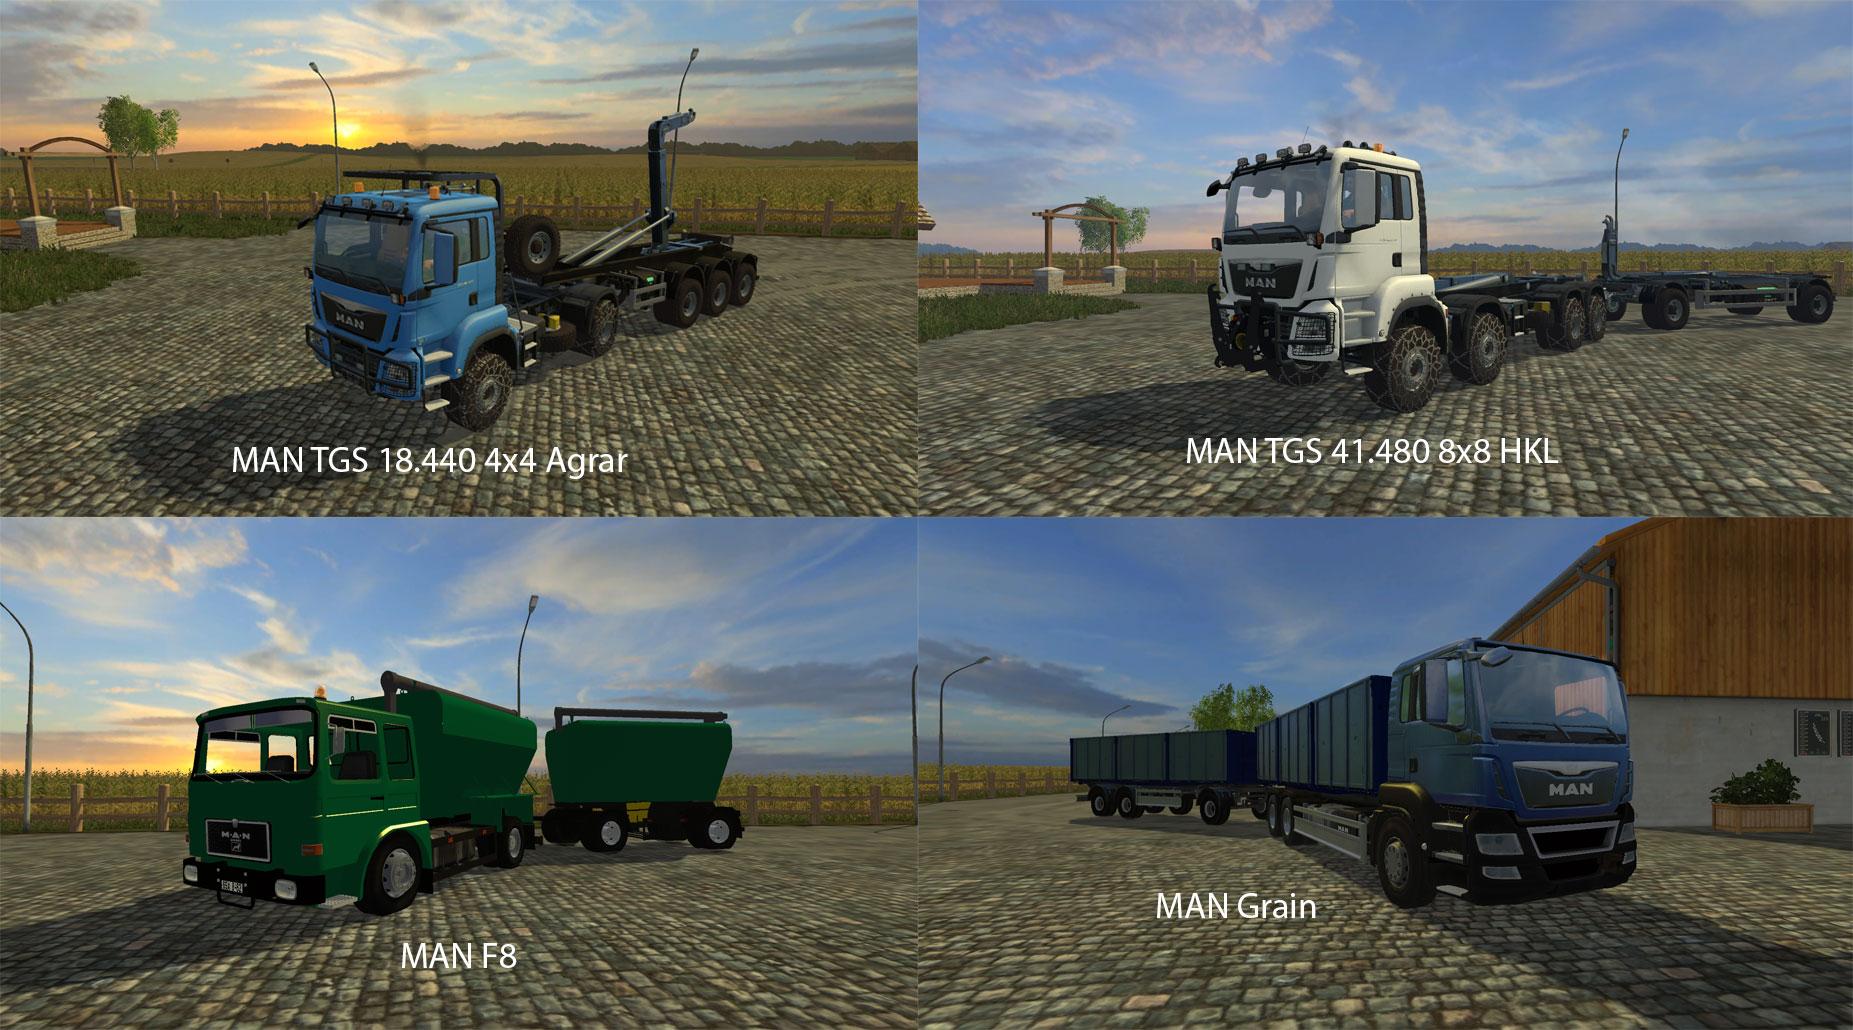 FS15 Big Mods Pack V17 MAN Trucks Pack V1 - Farming